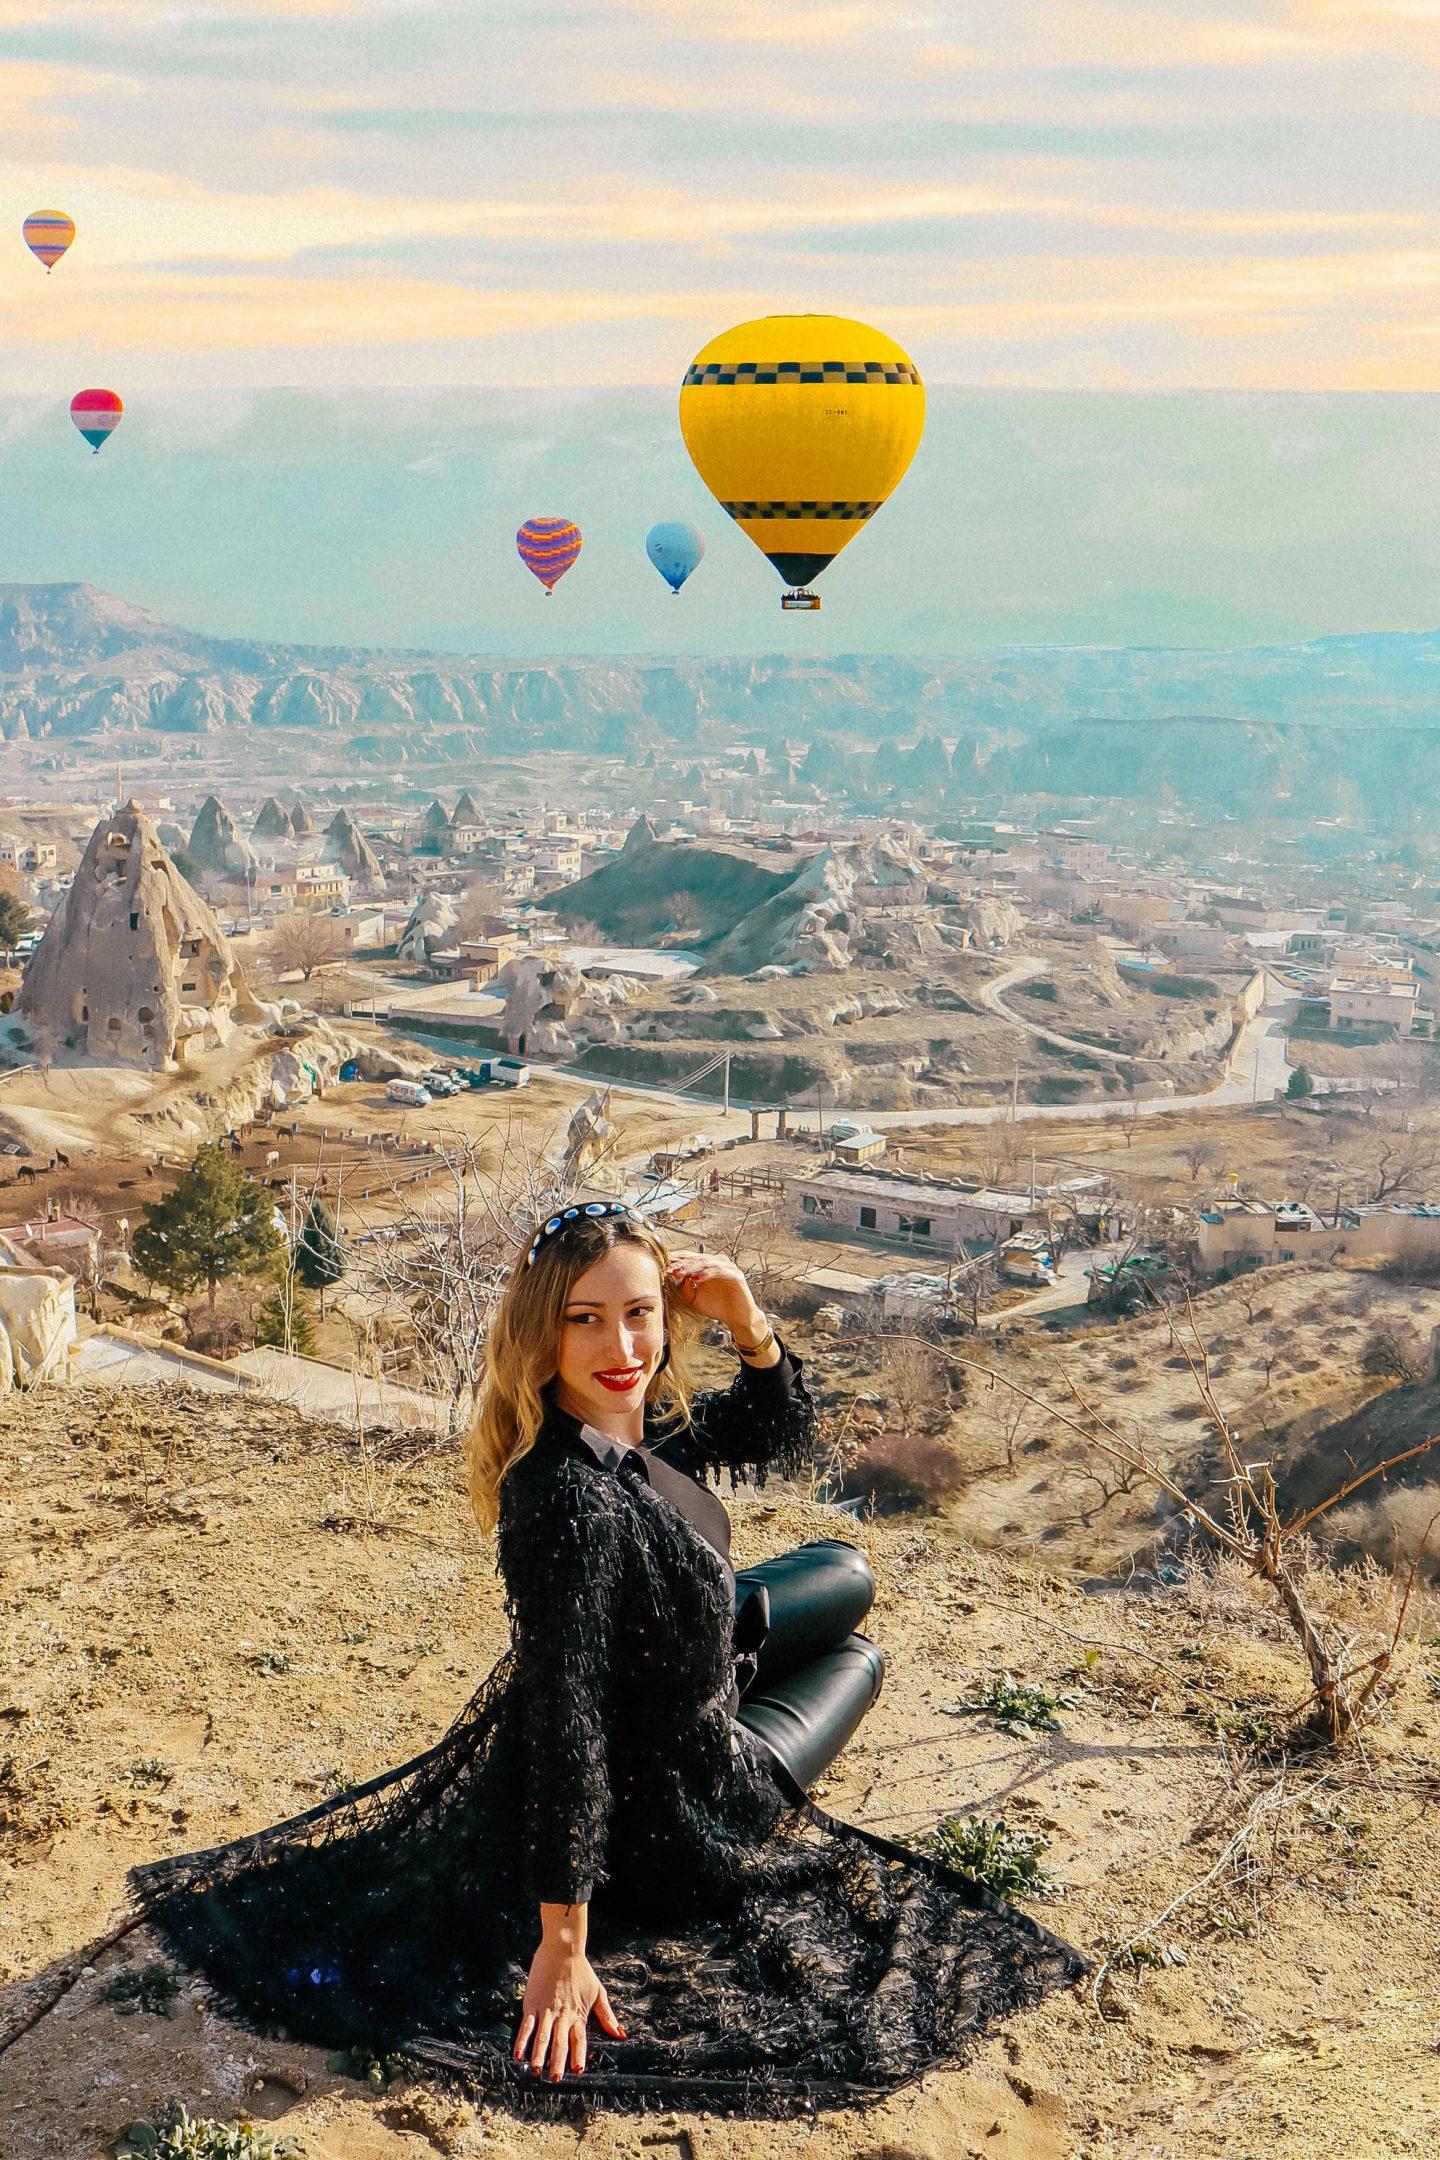 Trip to Cappadocia with Go Turkey